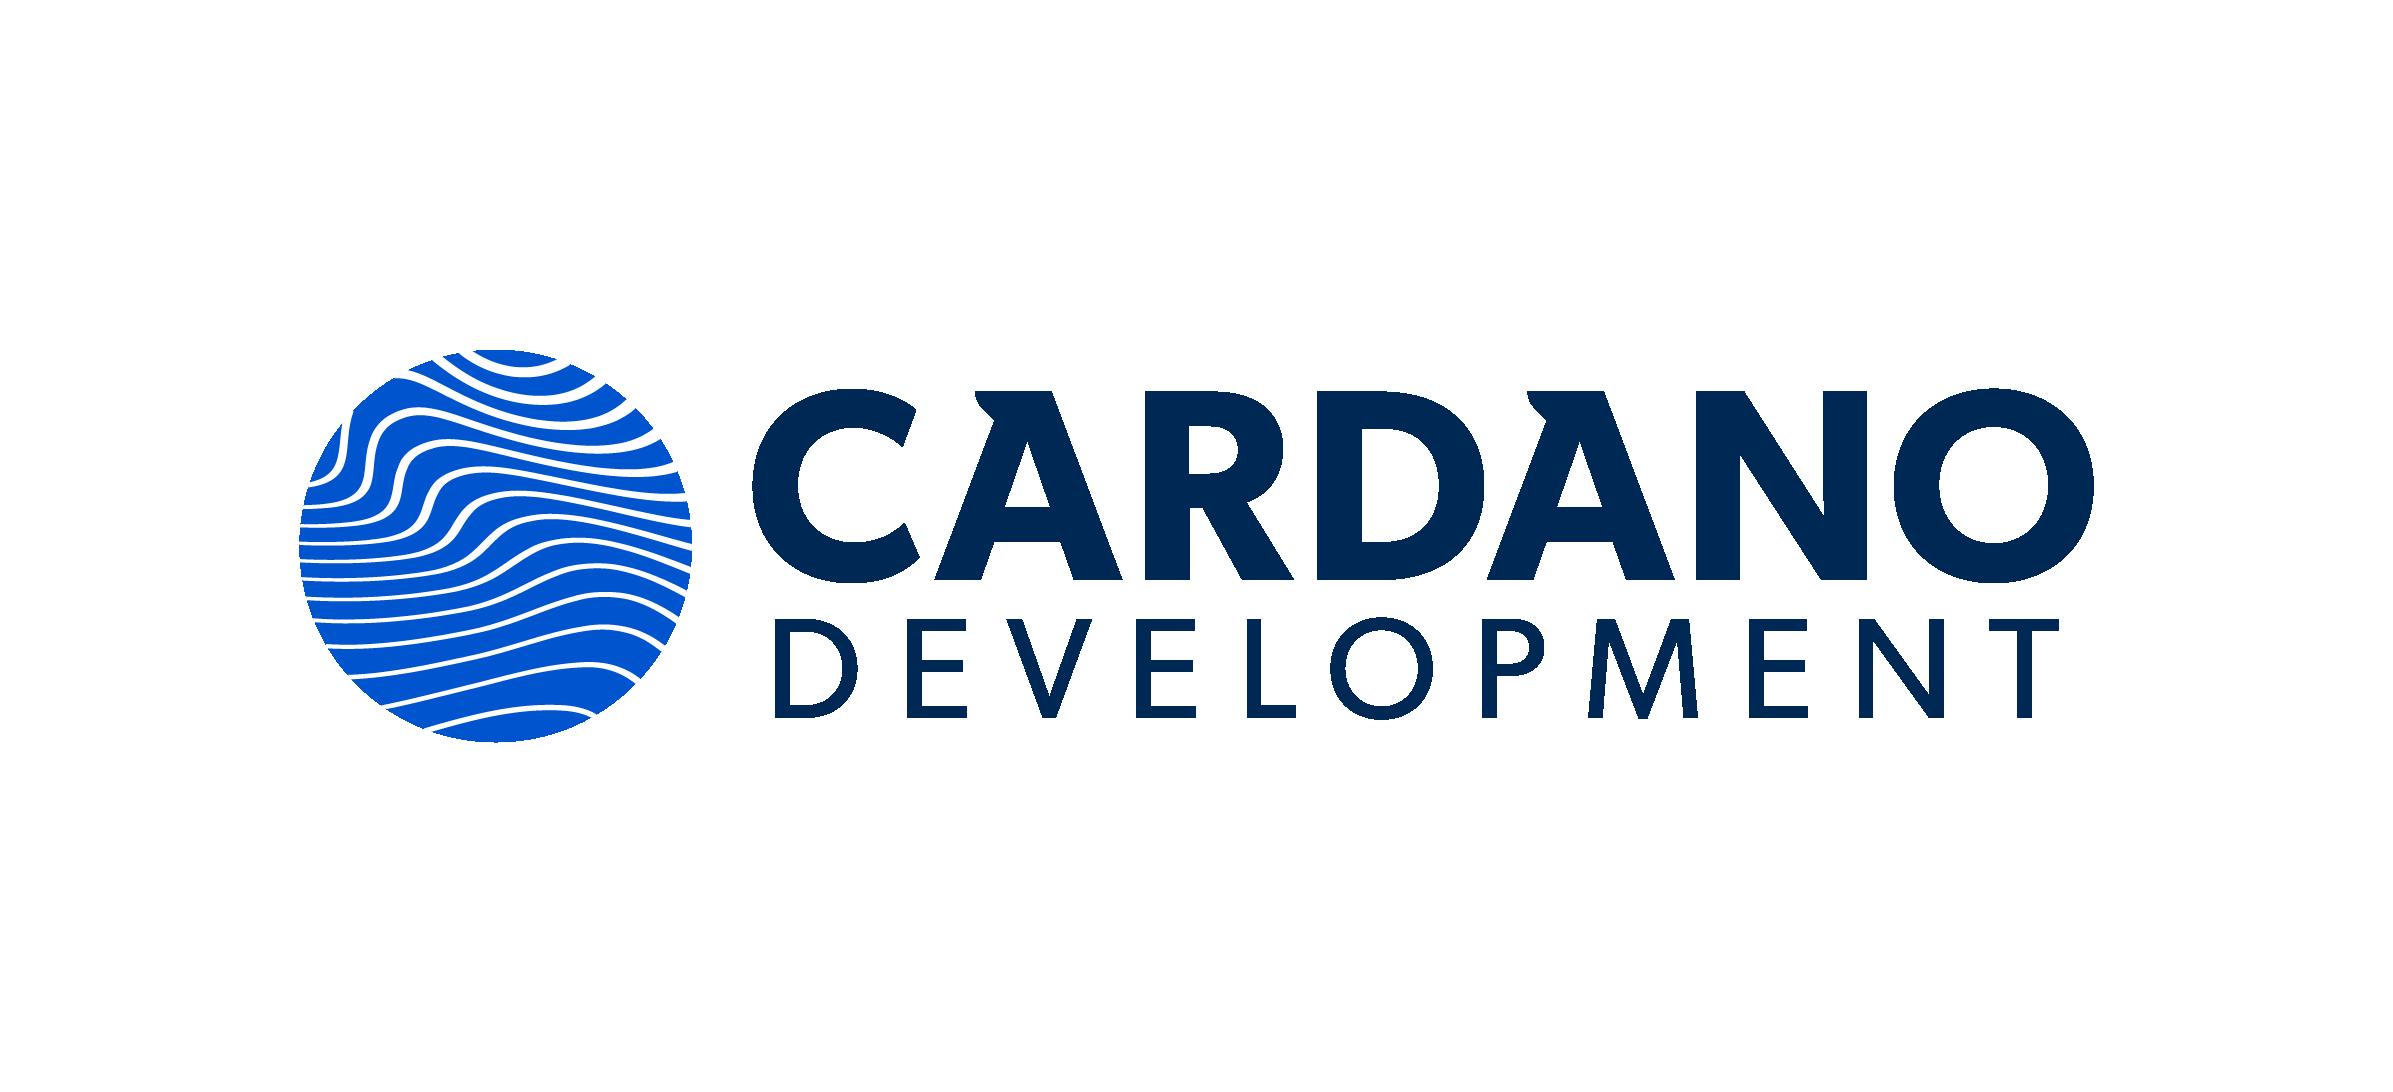 Cardano Development